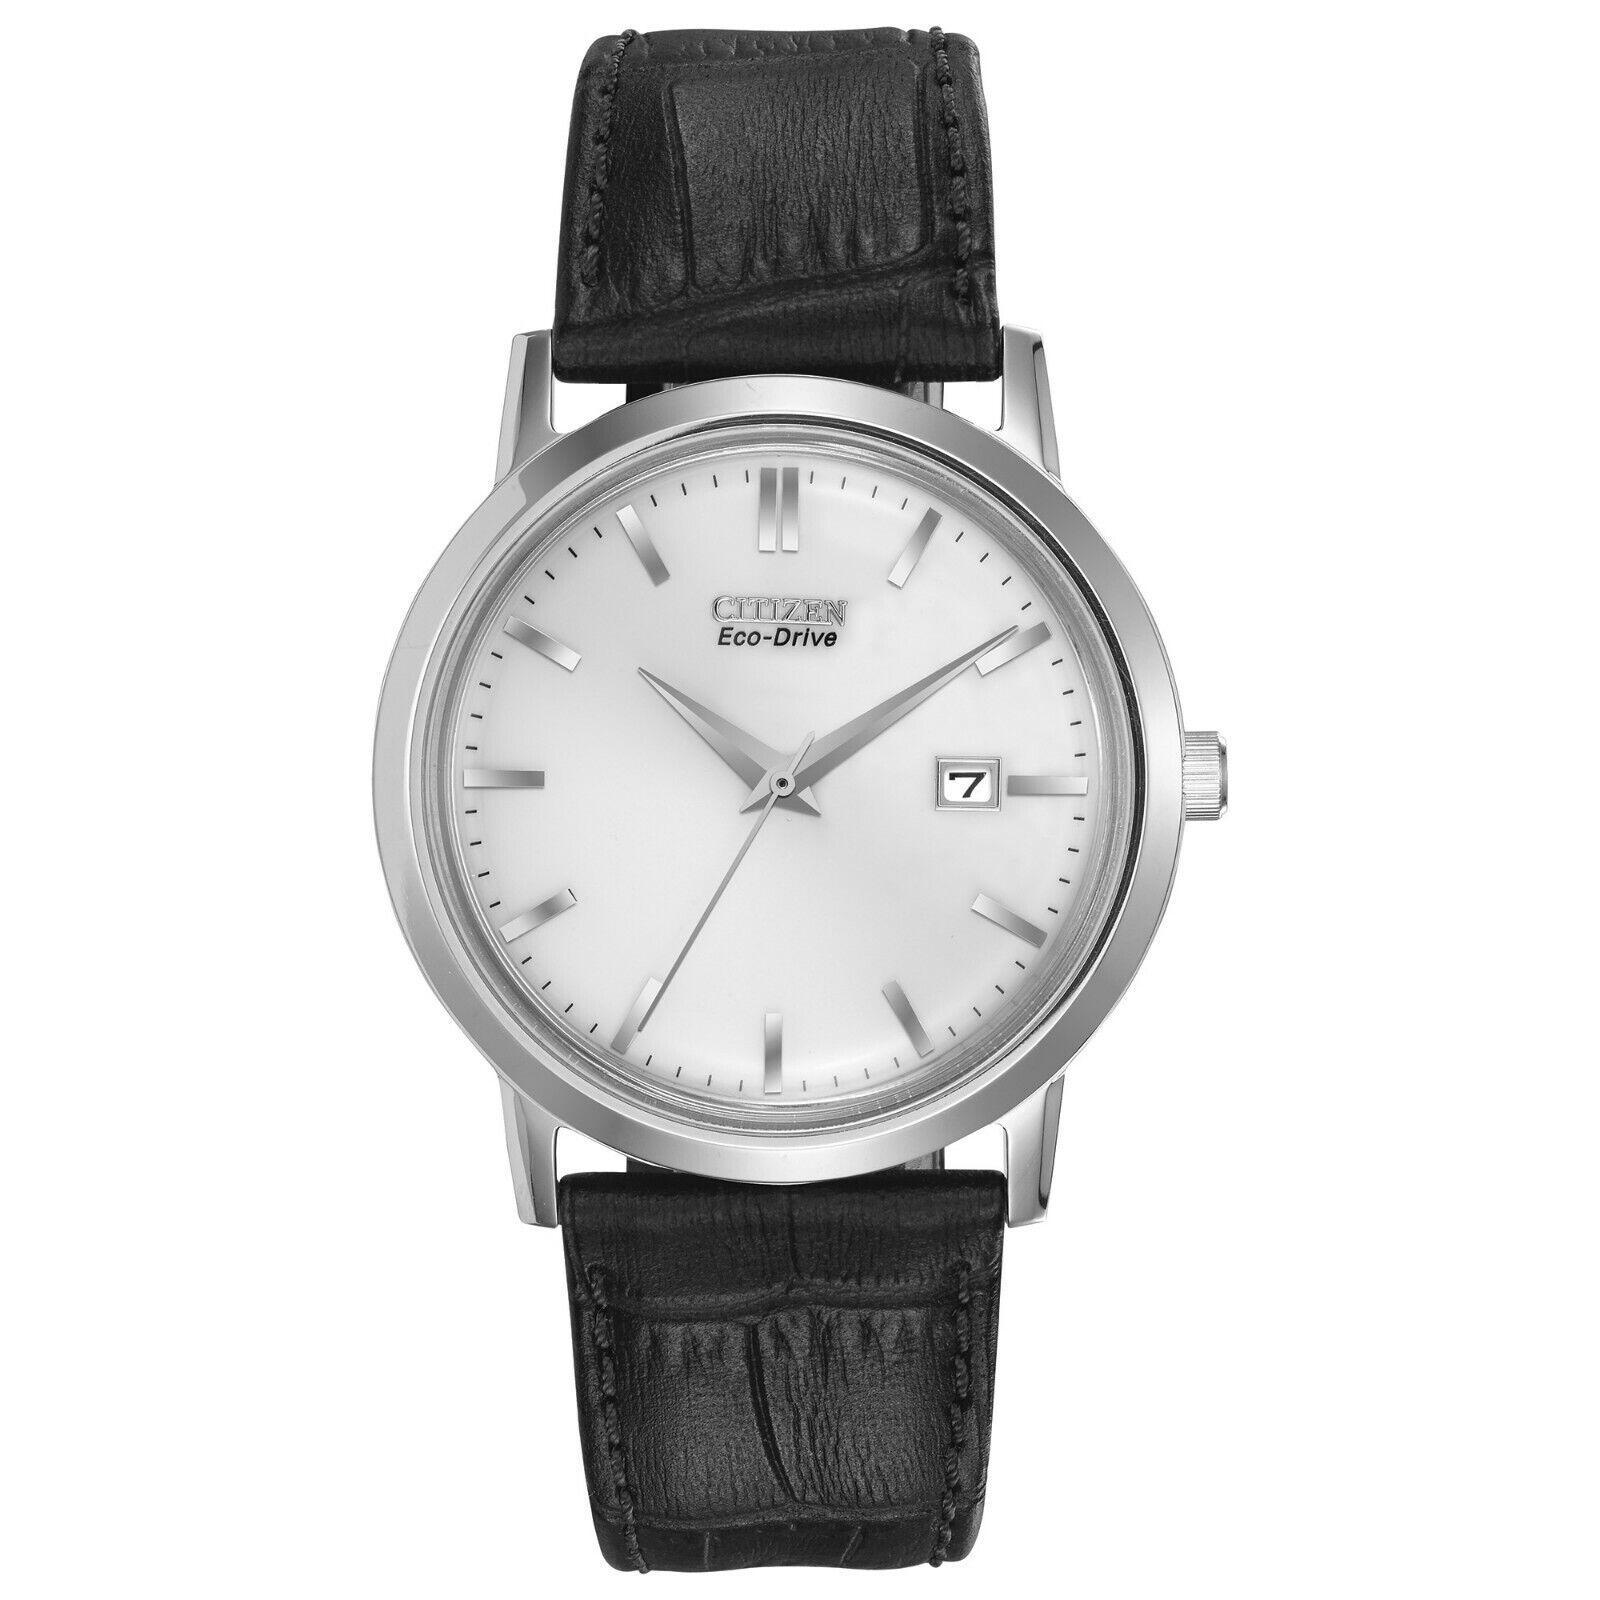 citizen-eco-drive-mens-silver-dial-black-leather-strap-40mm-watch-bm7190-05a